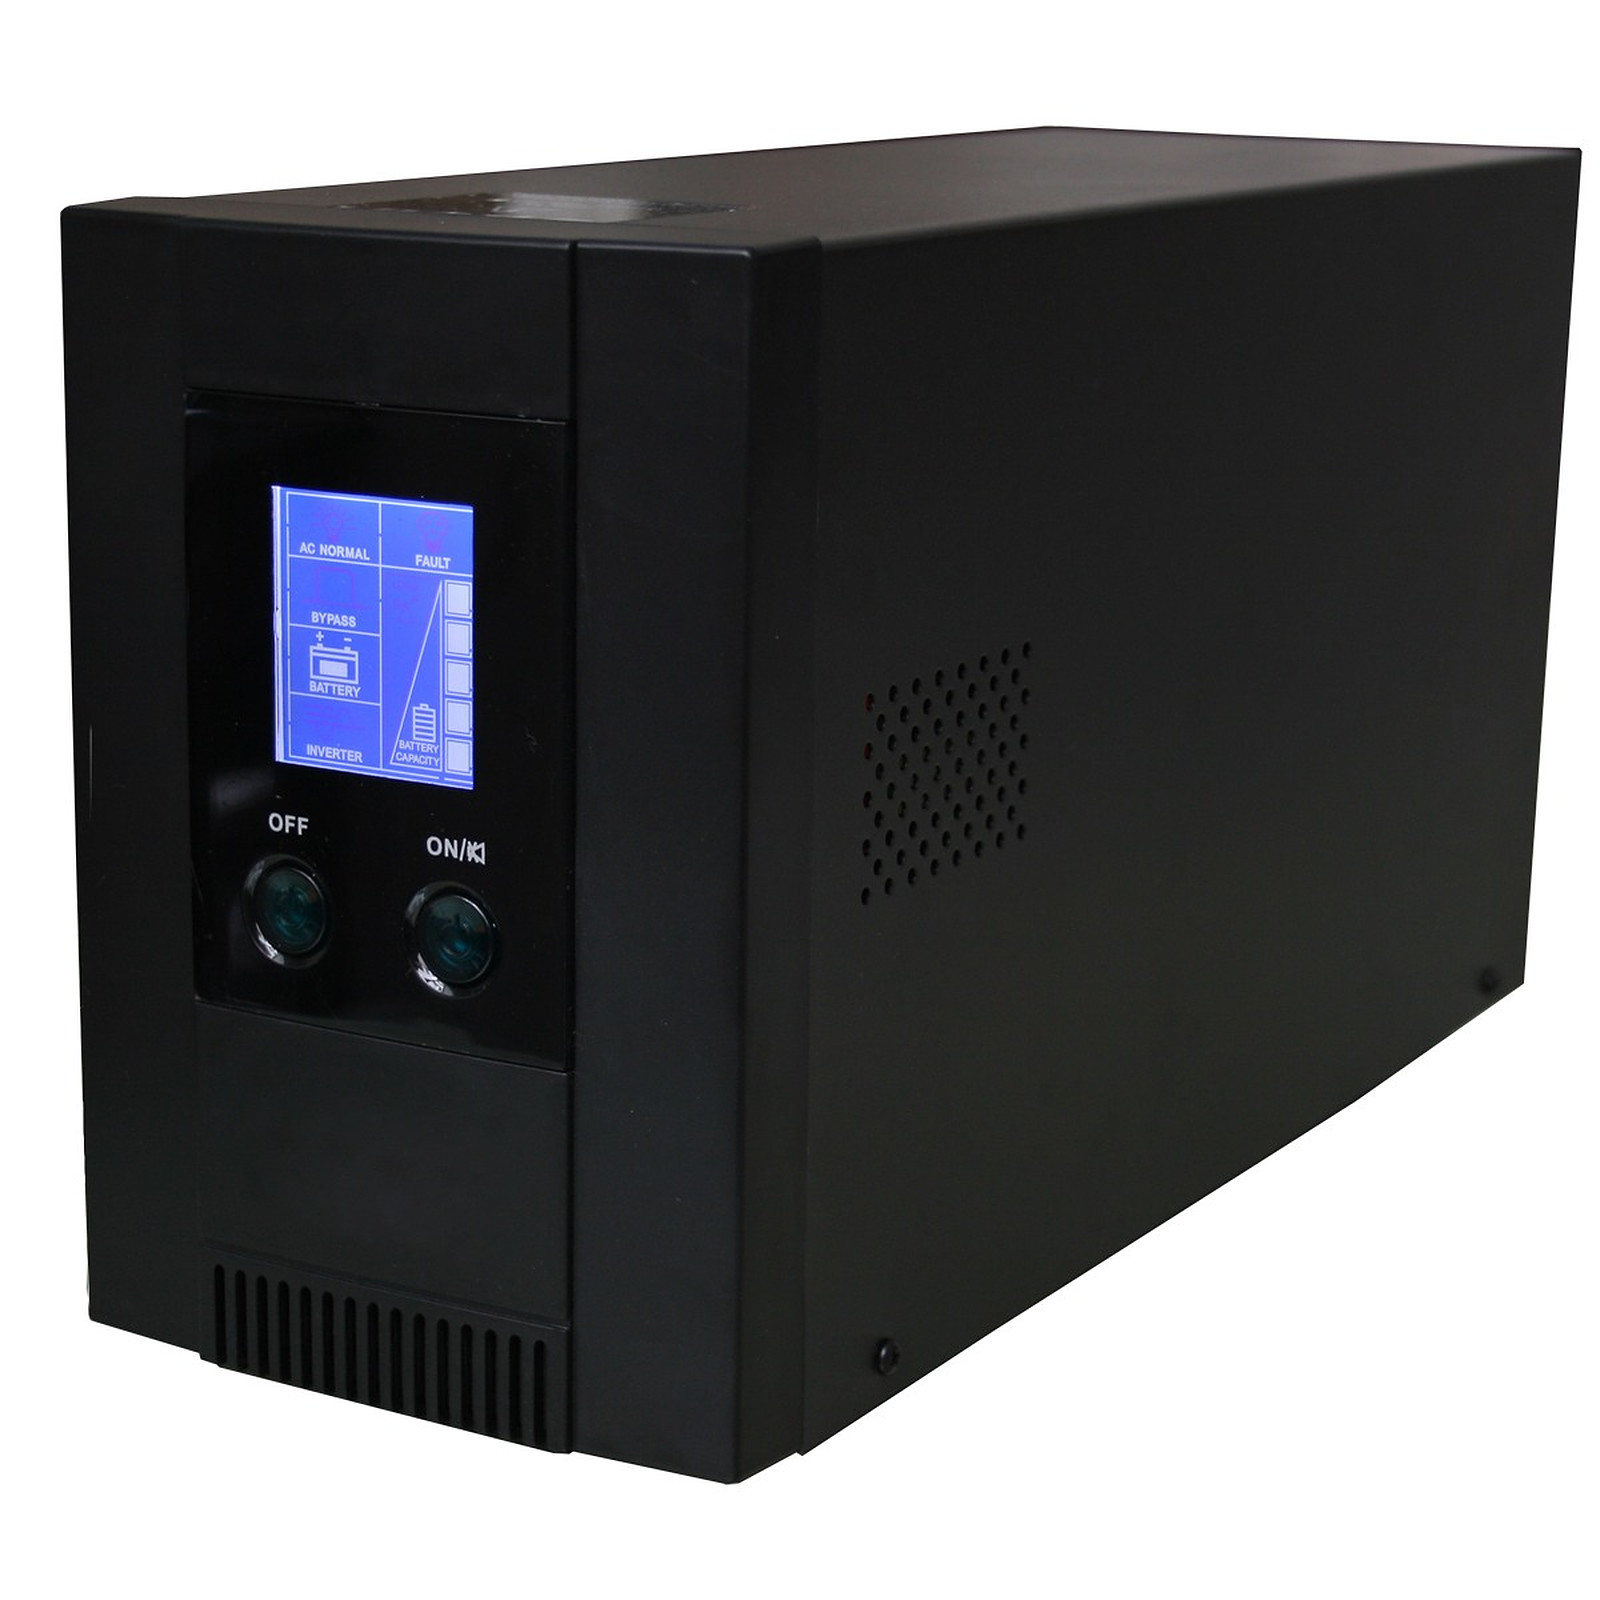 UPS-1000HB